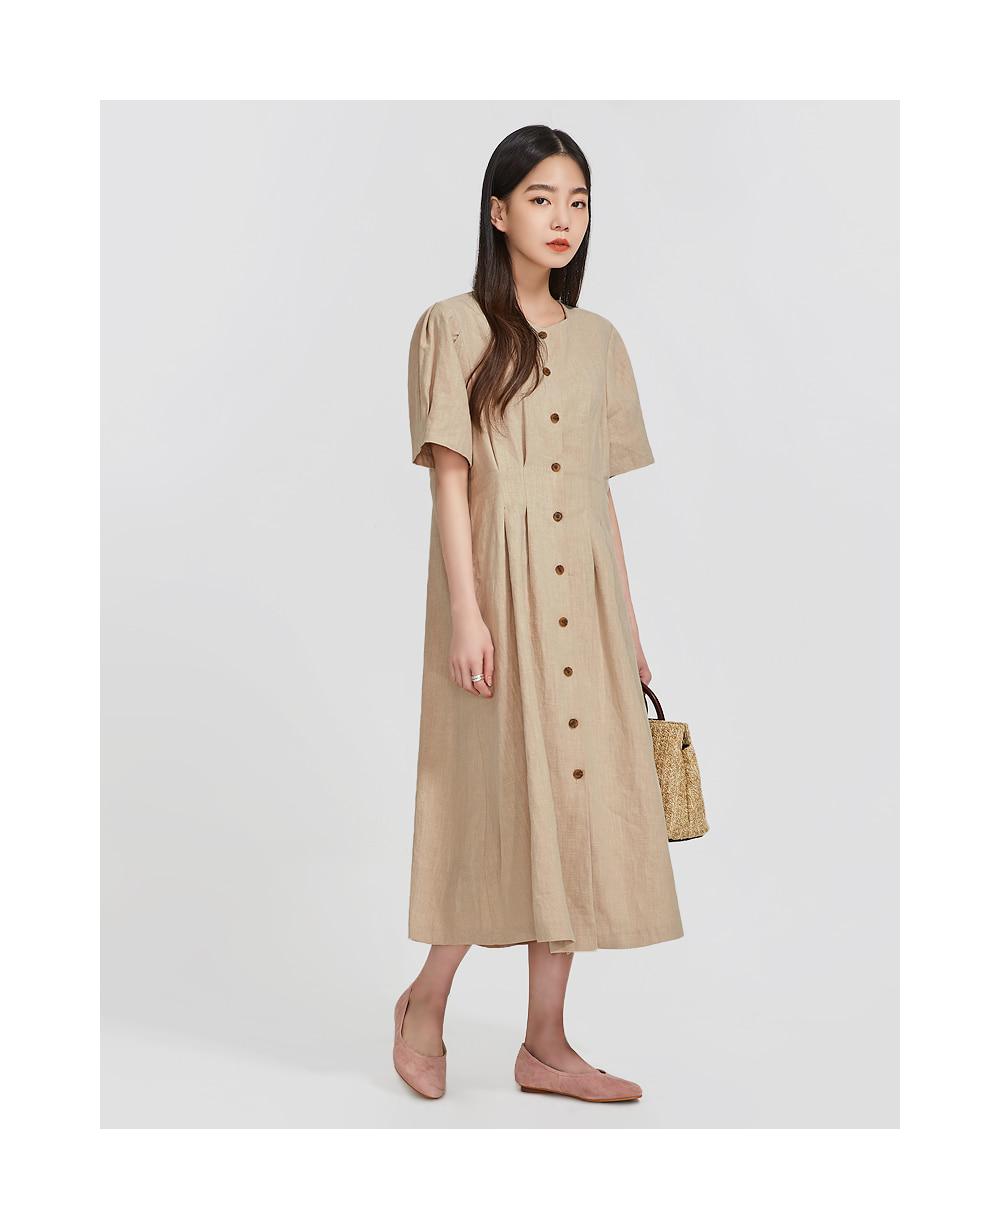 AIN - Korean Fashion - #Kfashion - Hand Ring Rattan Bag